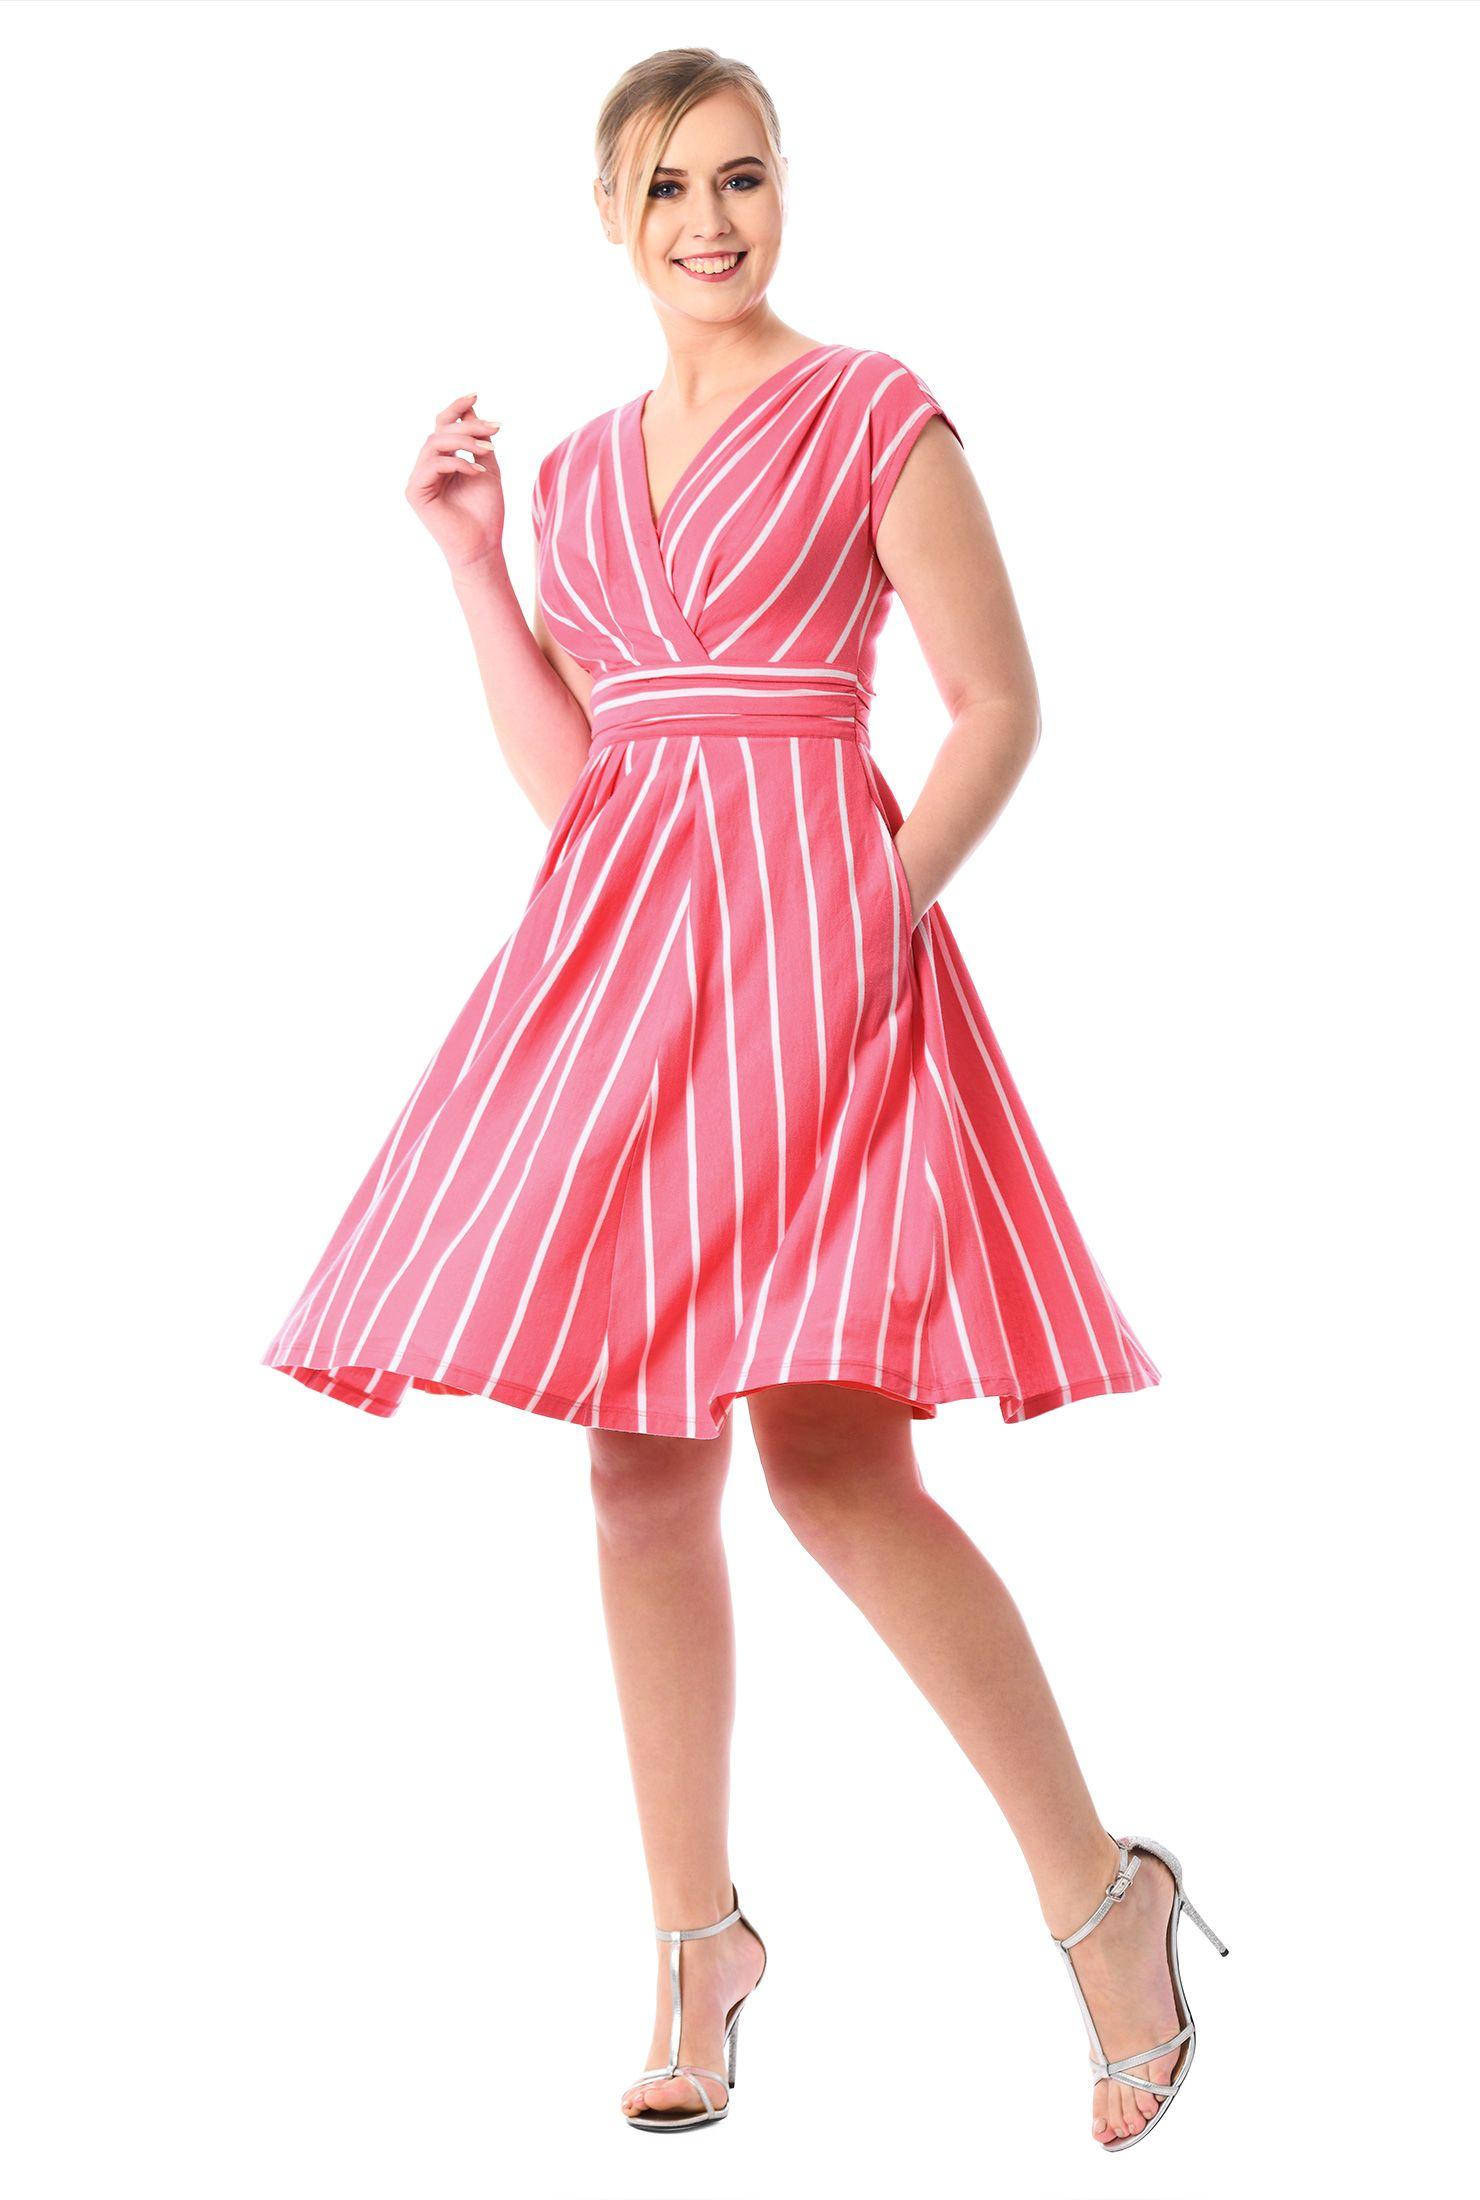 Stripe cotton knit surplice dress jersey knit dress surplice